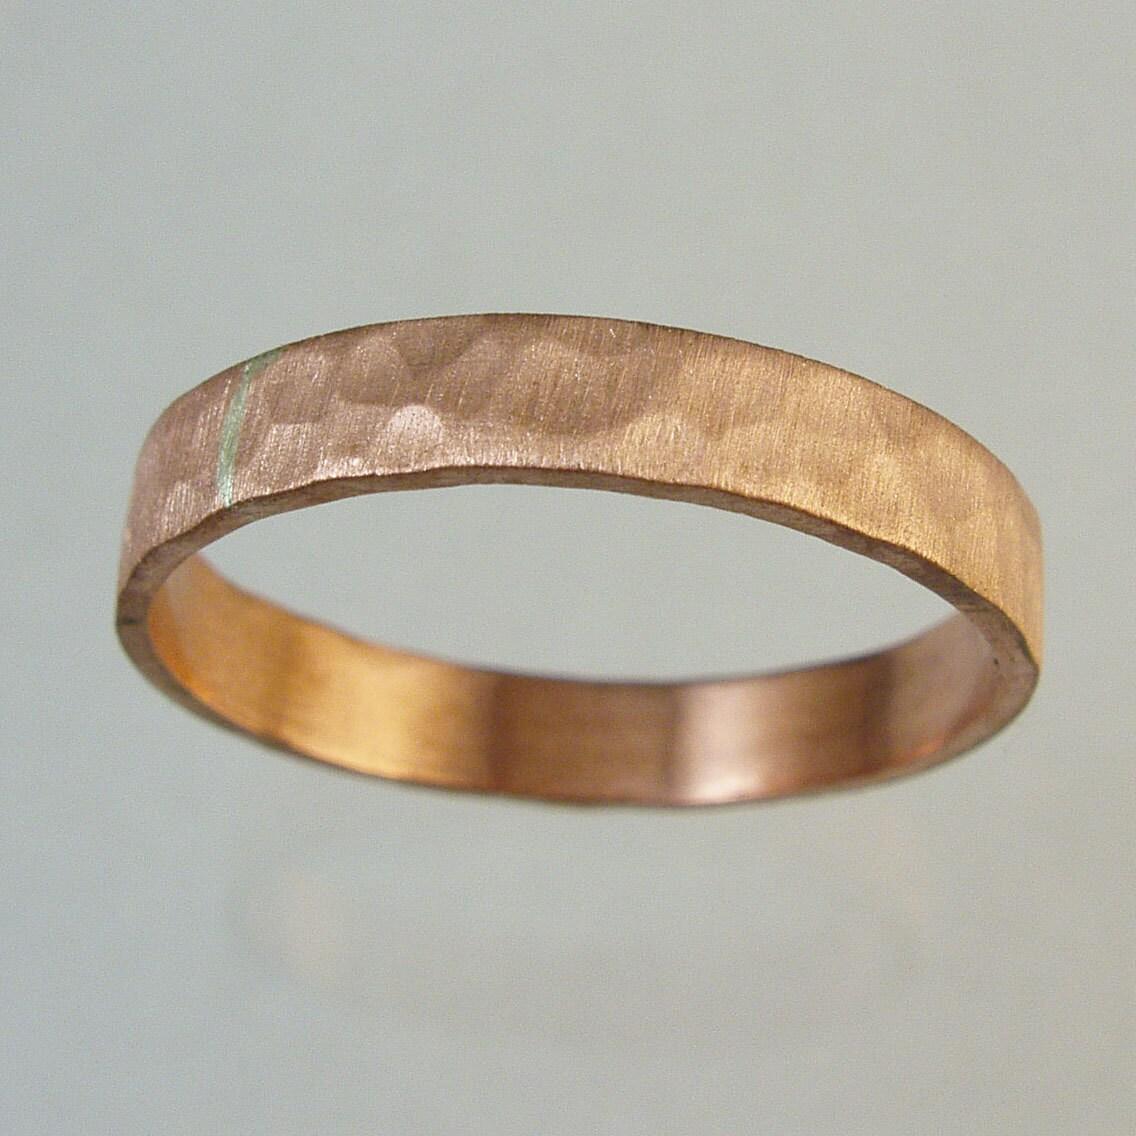 Mens wedding band made to order ringunisex wedding band for Wedding band engagement ring order